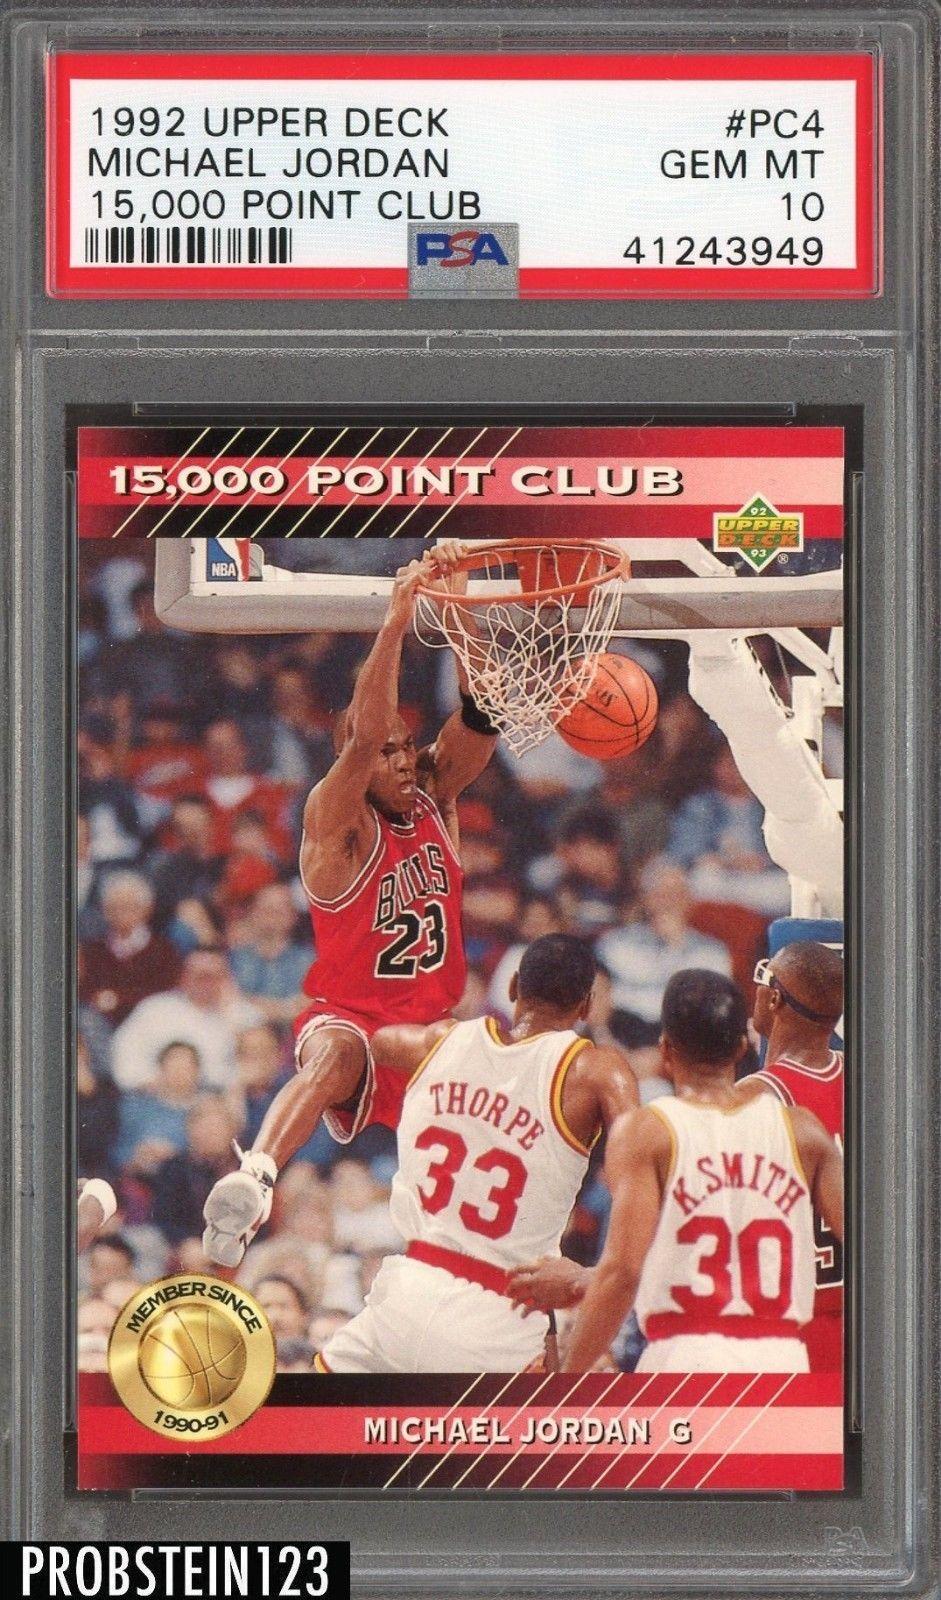 1992 upper deck 15000 point club pc4 michael jordan psa